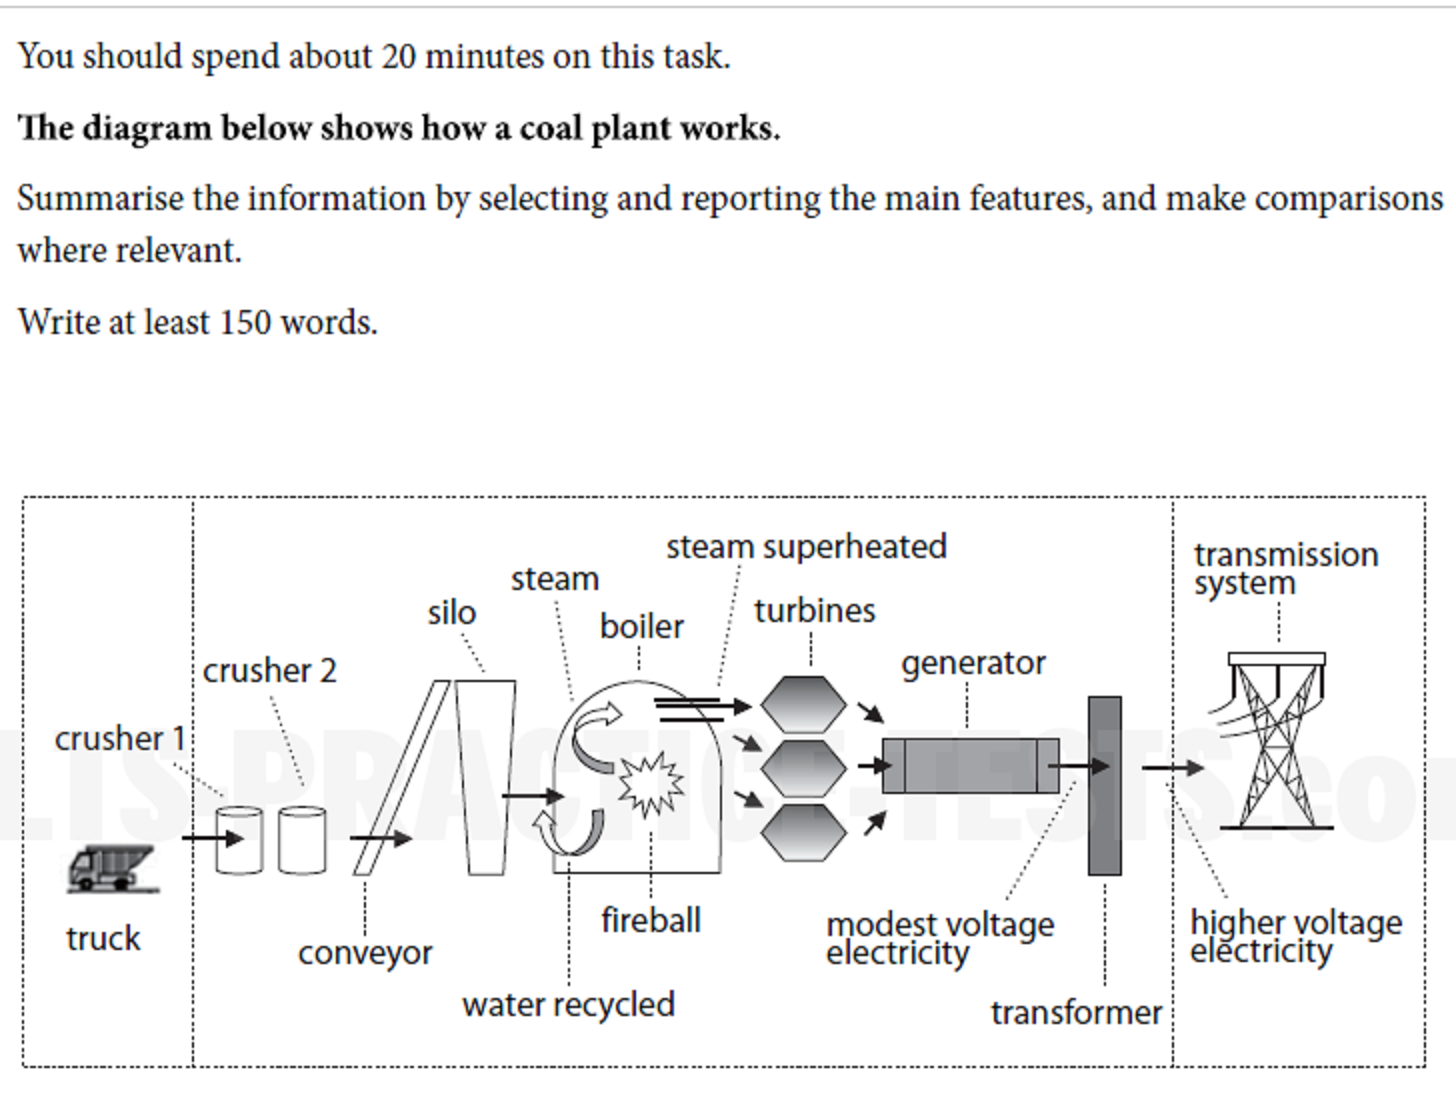 coal plant process ielts task 1 band 7 5 [ 1456 x 1096 Pixel ]